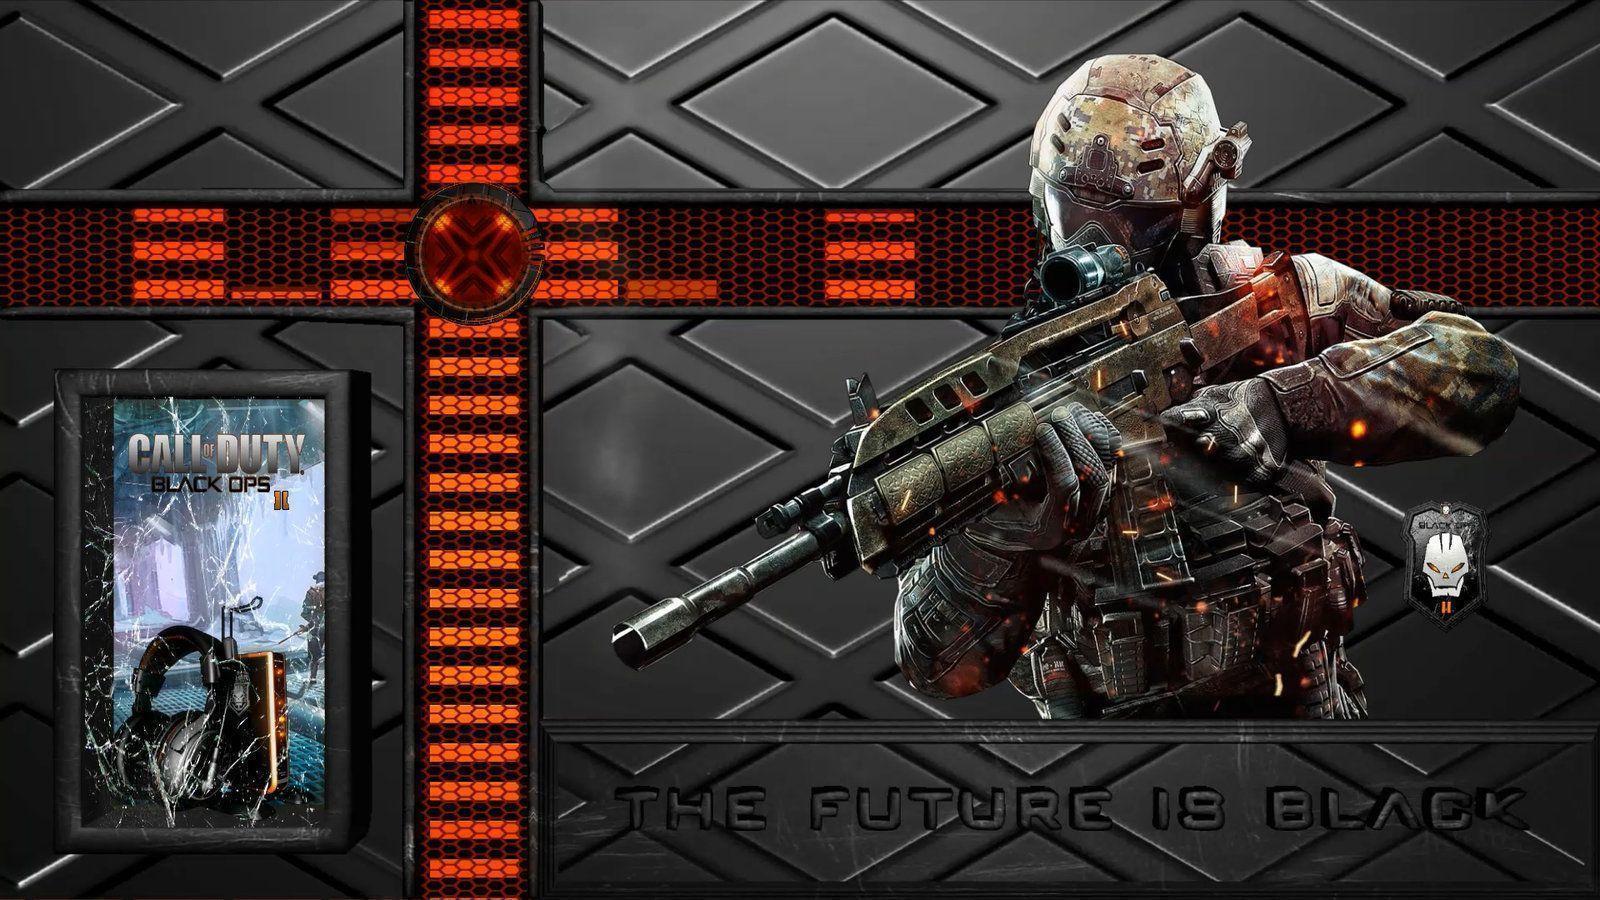 Ps3 Themes Black Ops 2 (id: 34779)   WallPho.com